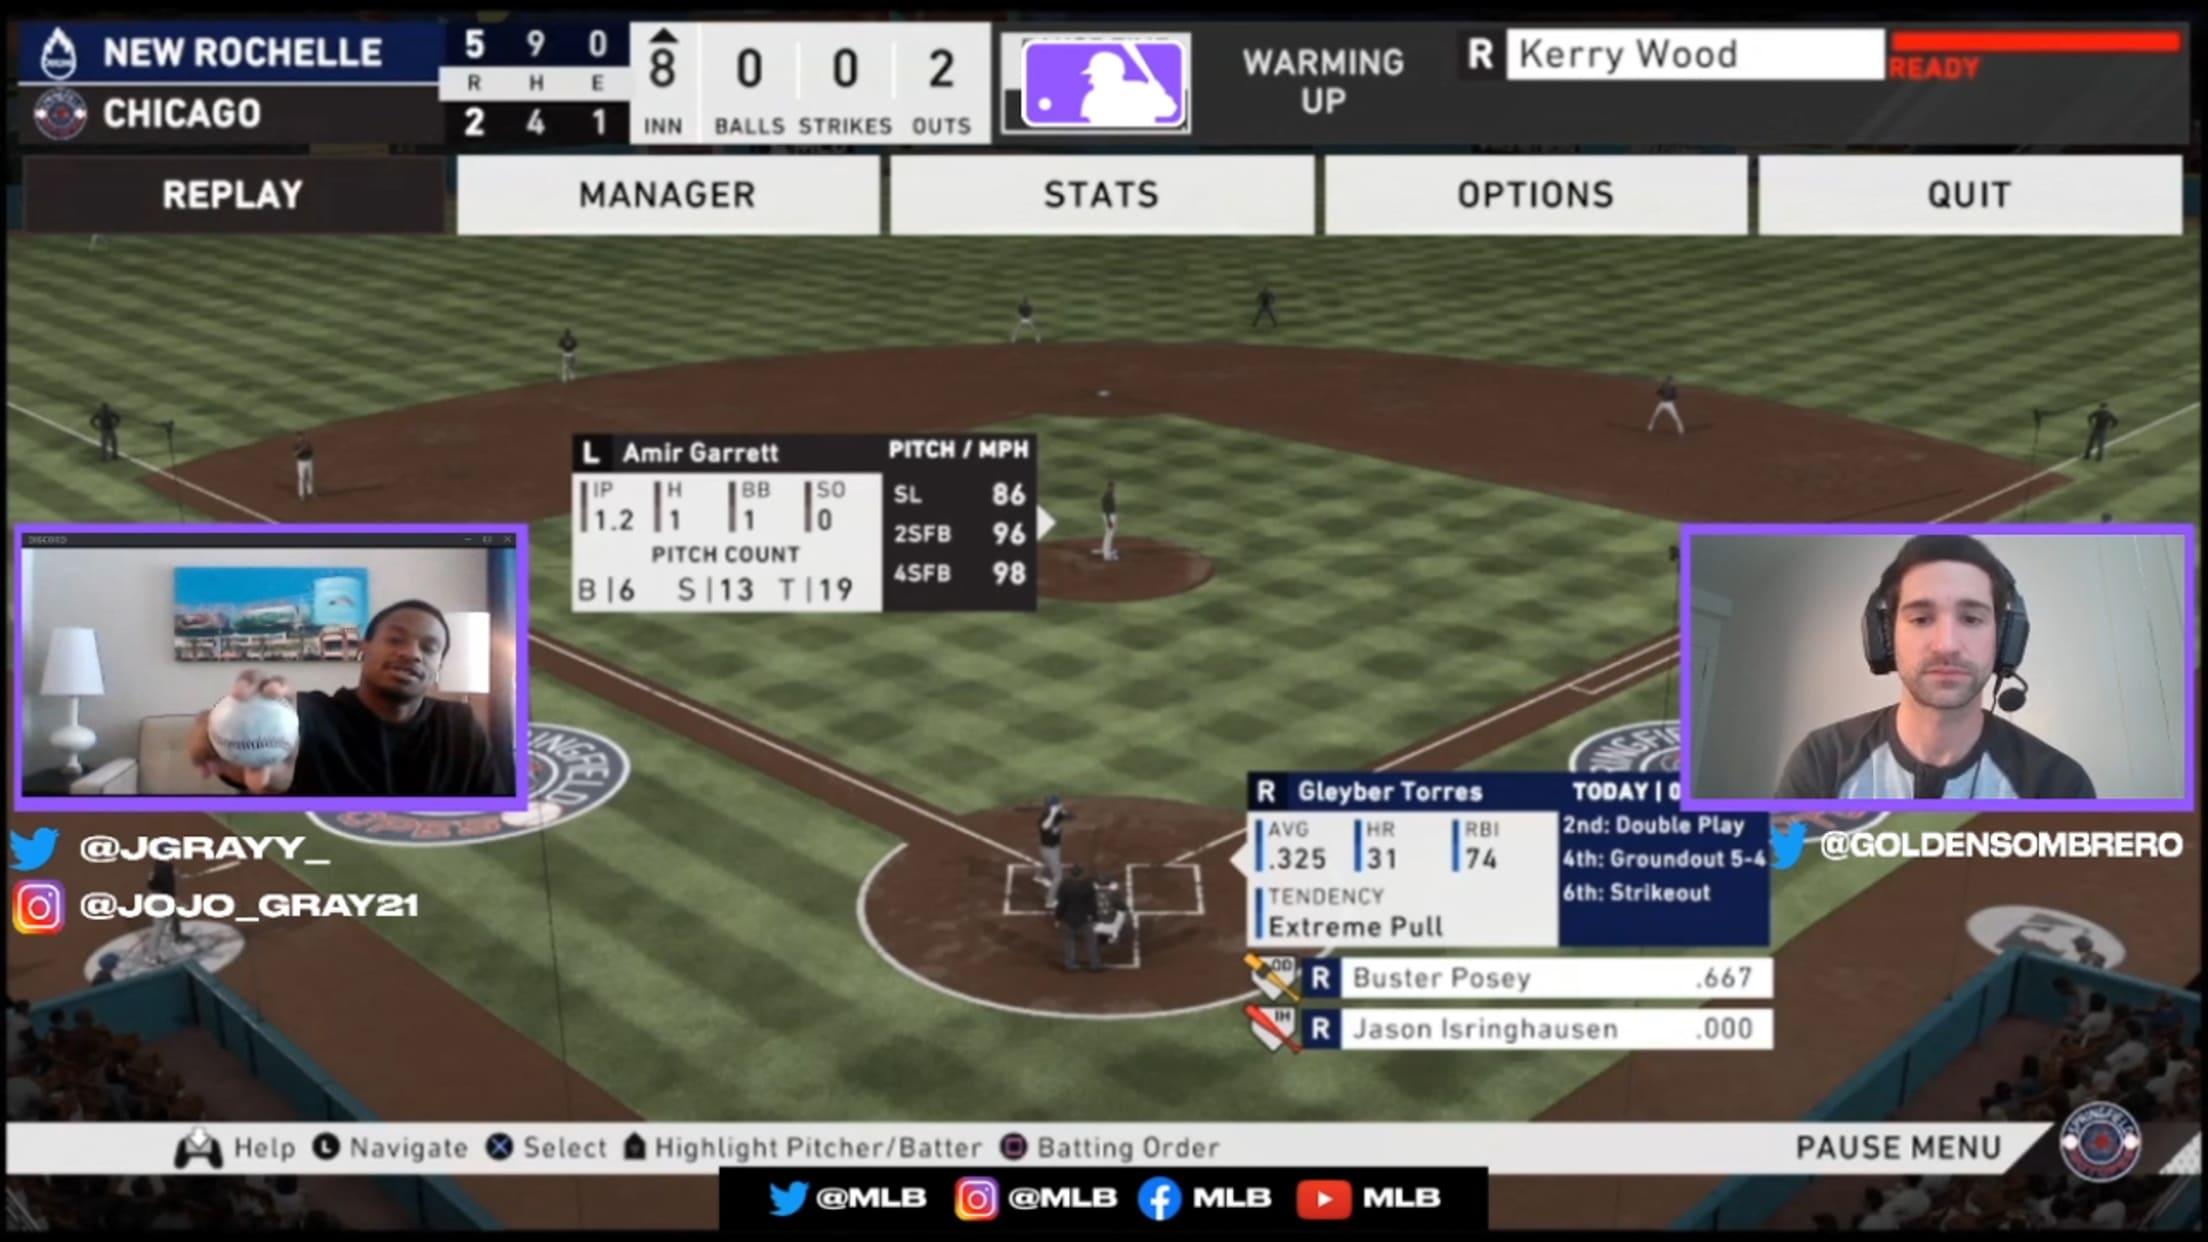 Josiah Gray's fastball grip